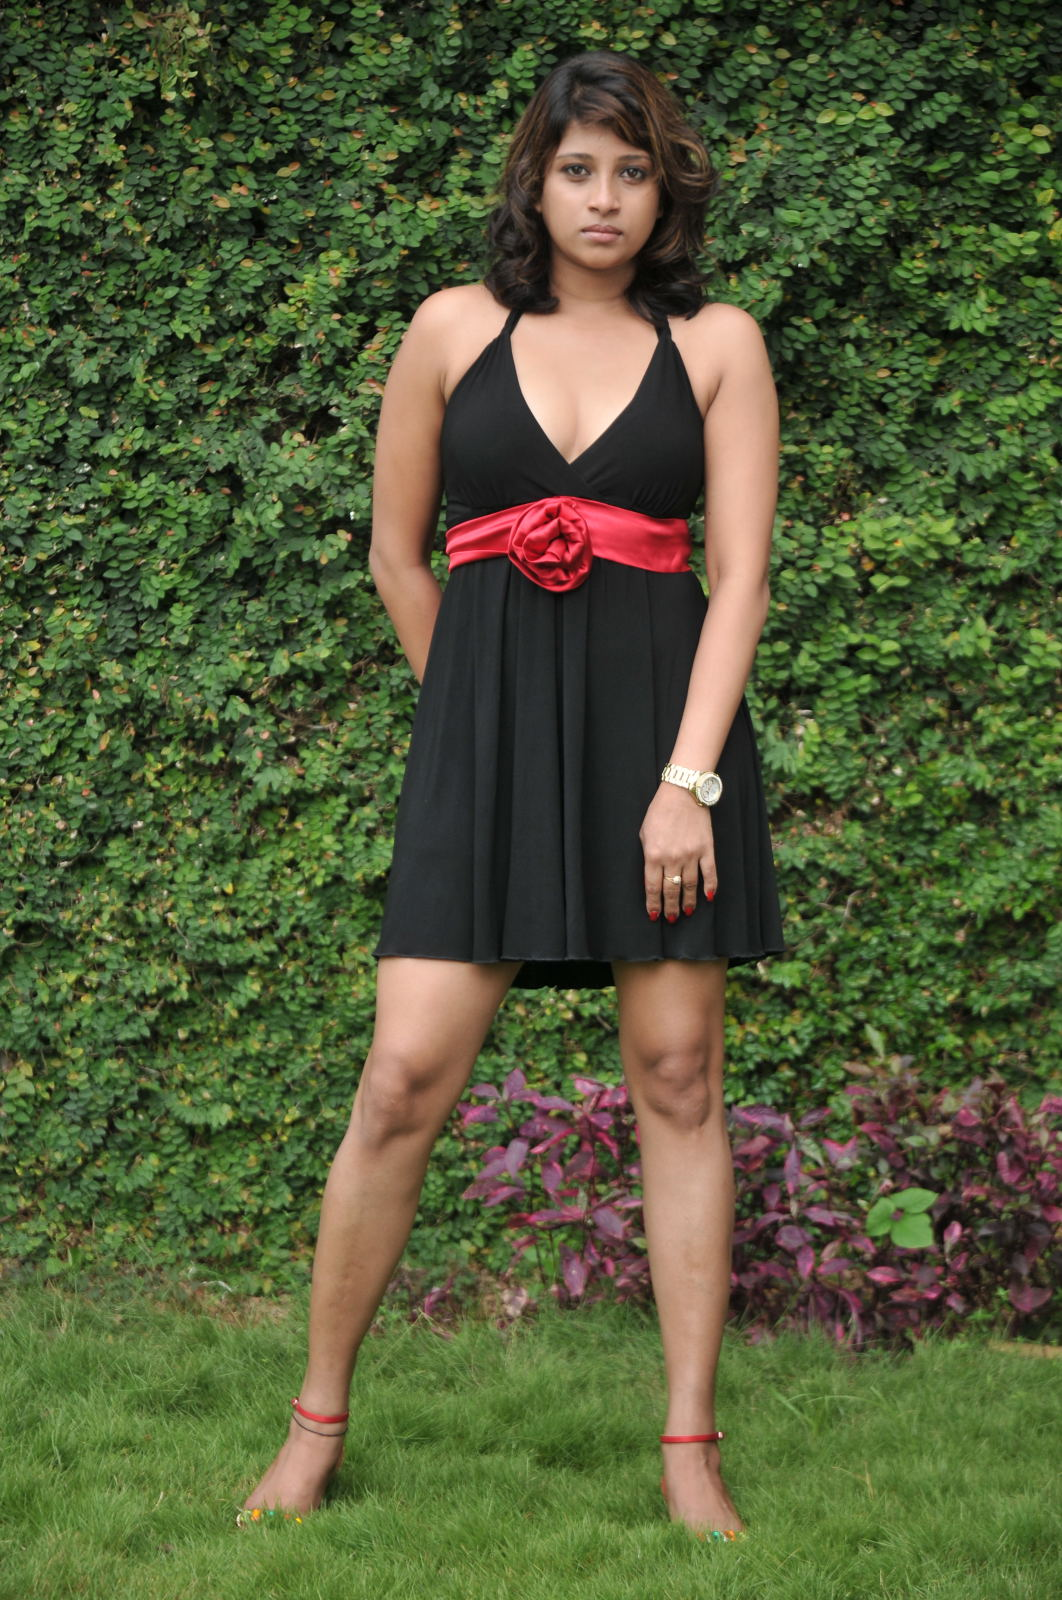 Hot Amp Hot Photos Nadeesha Hemamali Hot Pictures